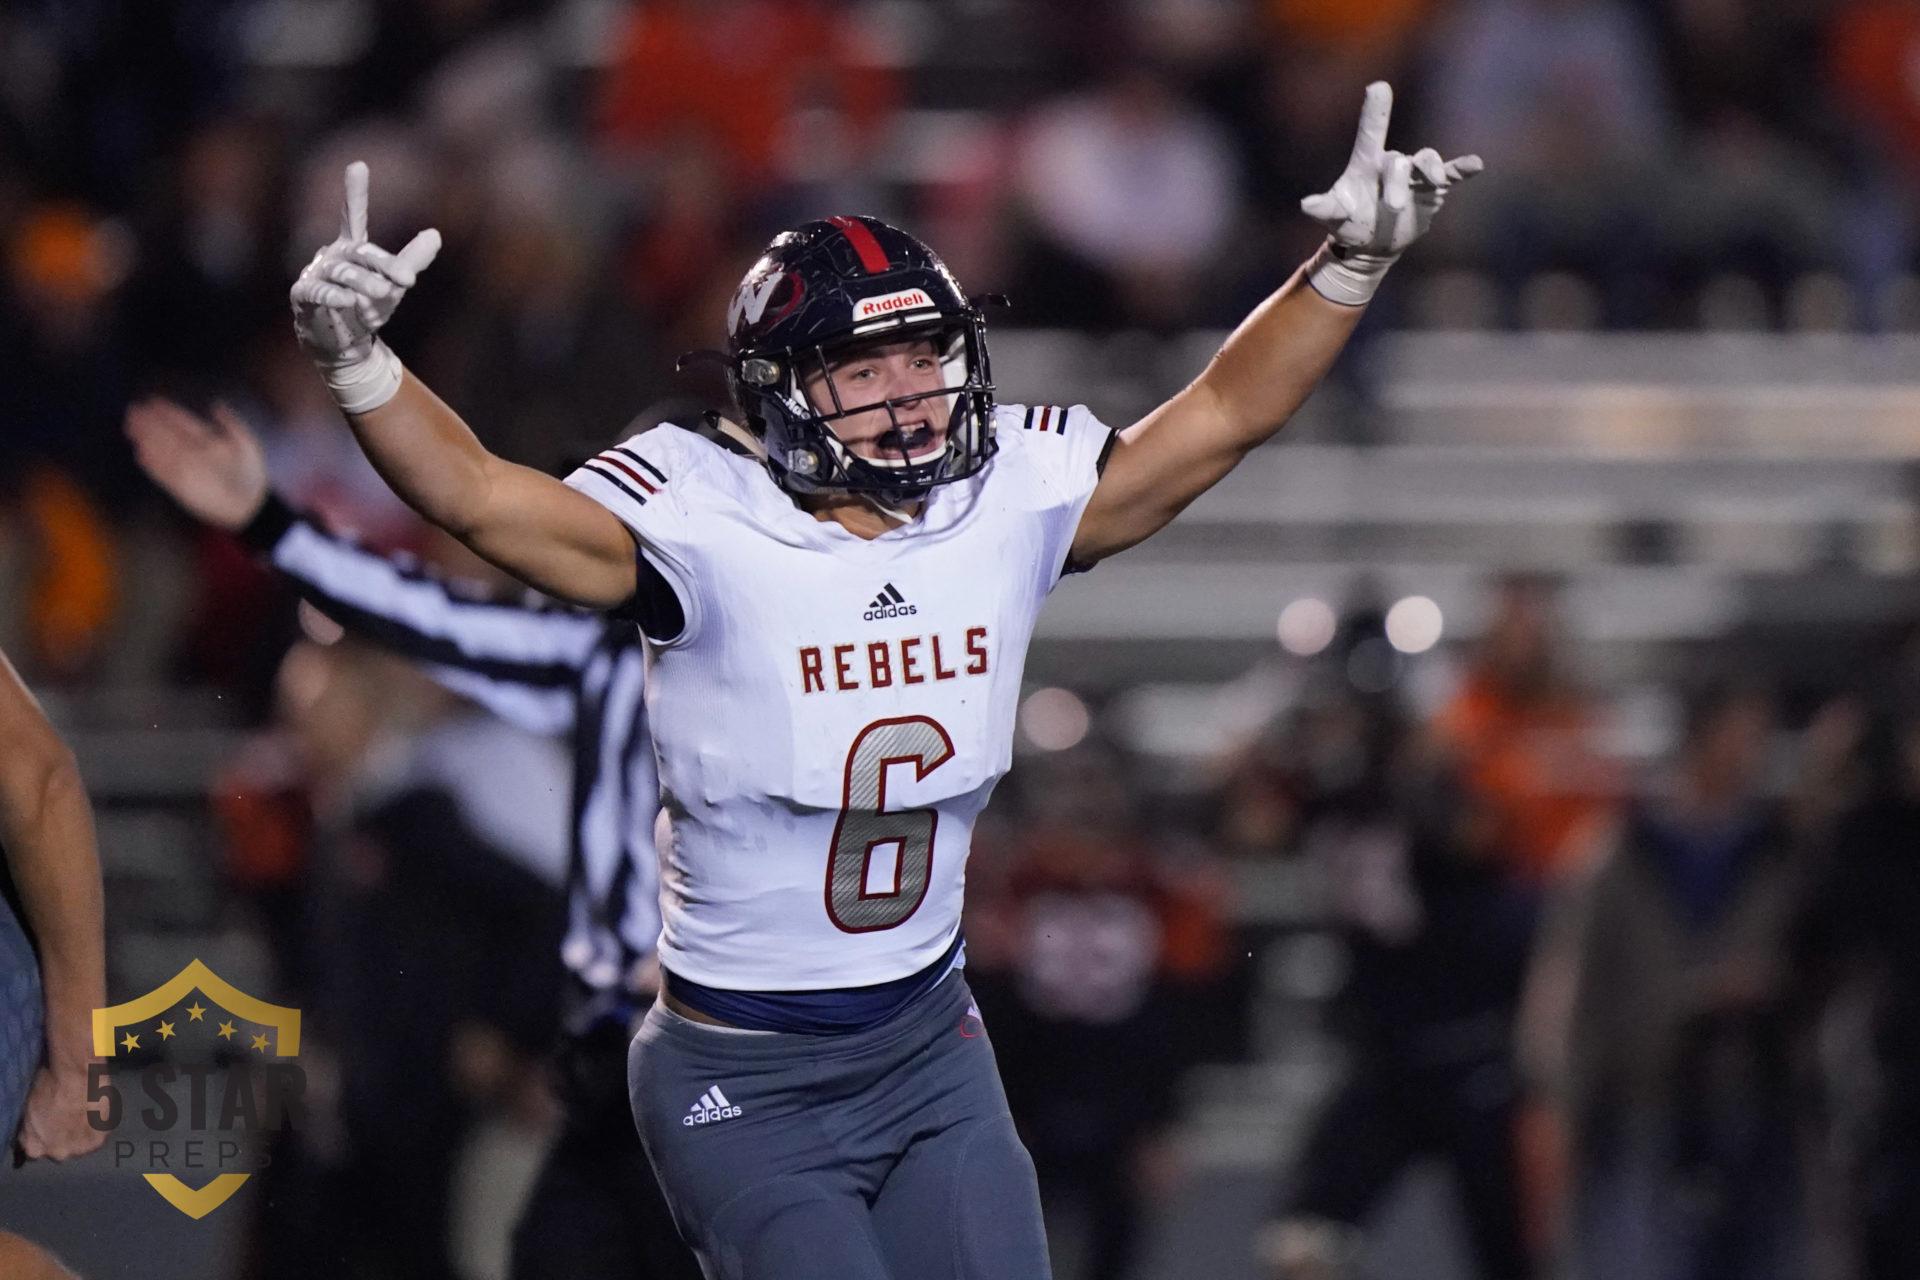 Tssaa 5a State Football Playoffs 2019 West Vs Powell Nov 22 Five Star Preps